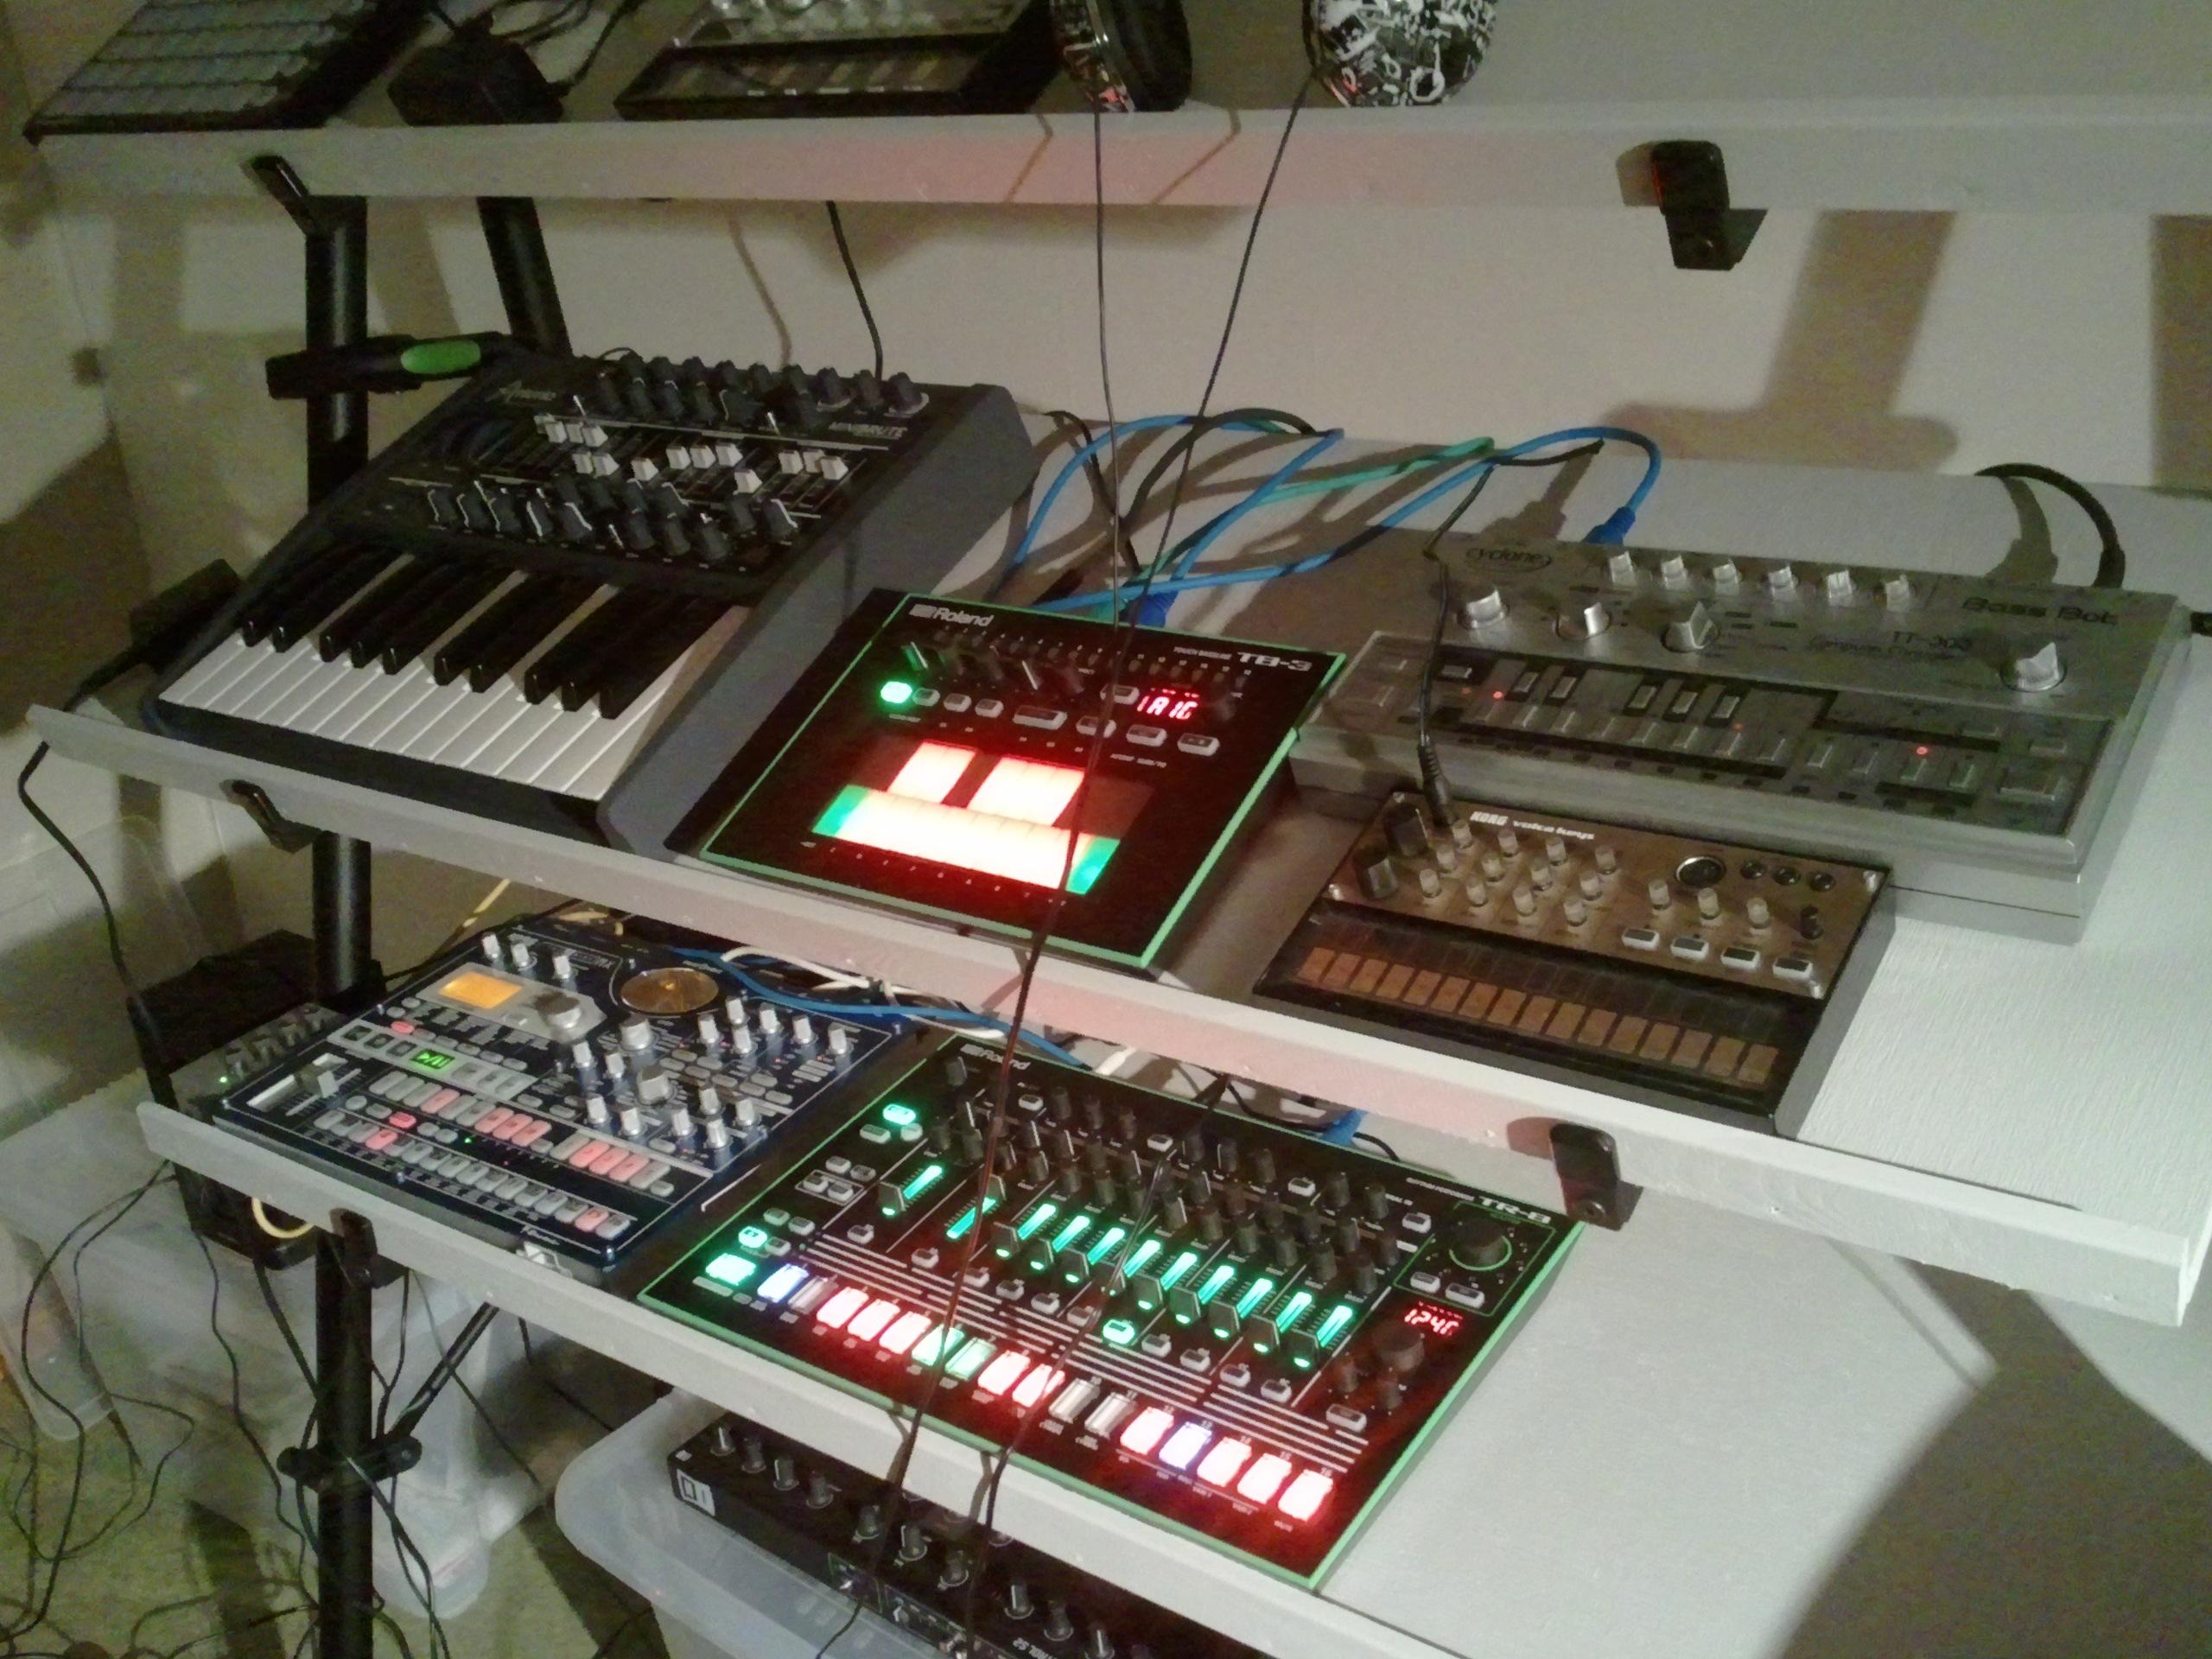 FileMusic Shelf On Studio